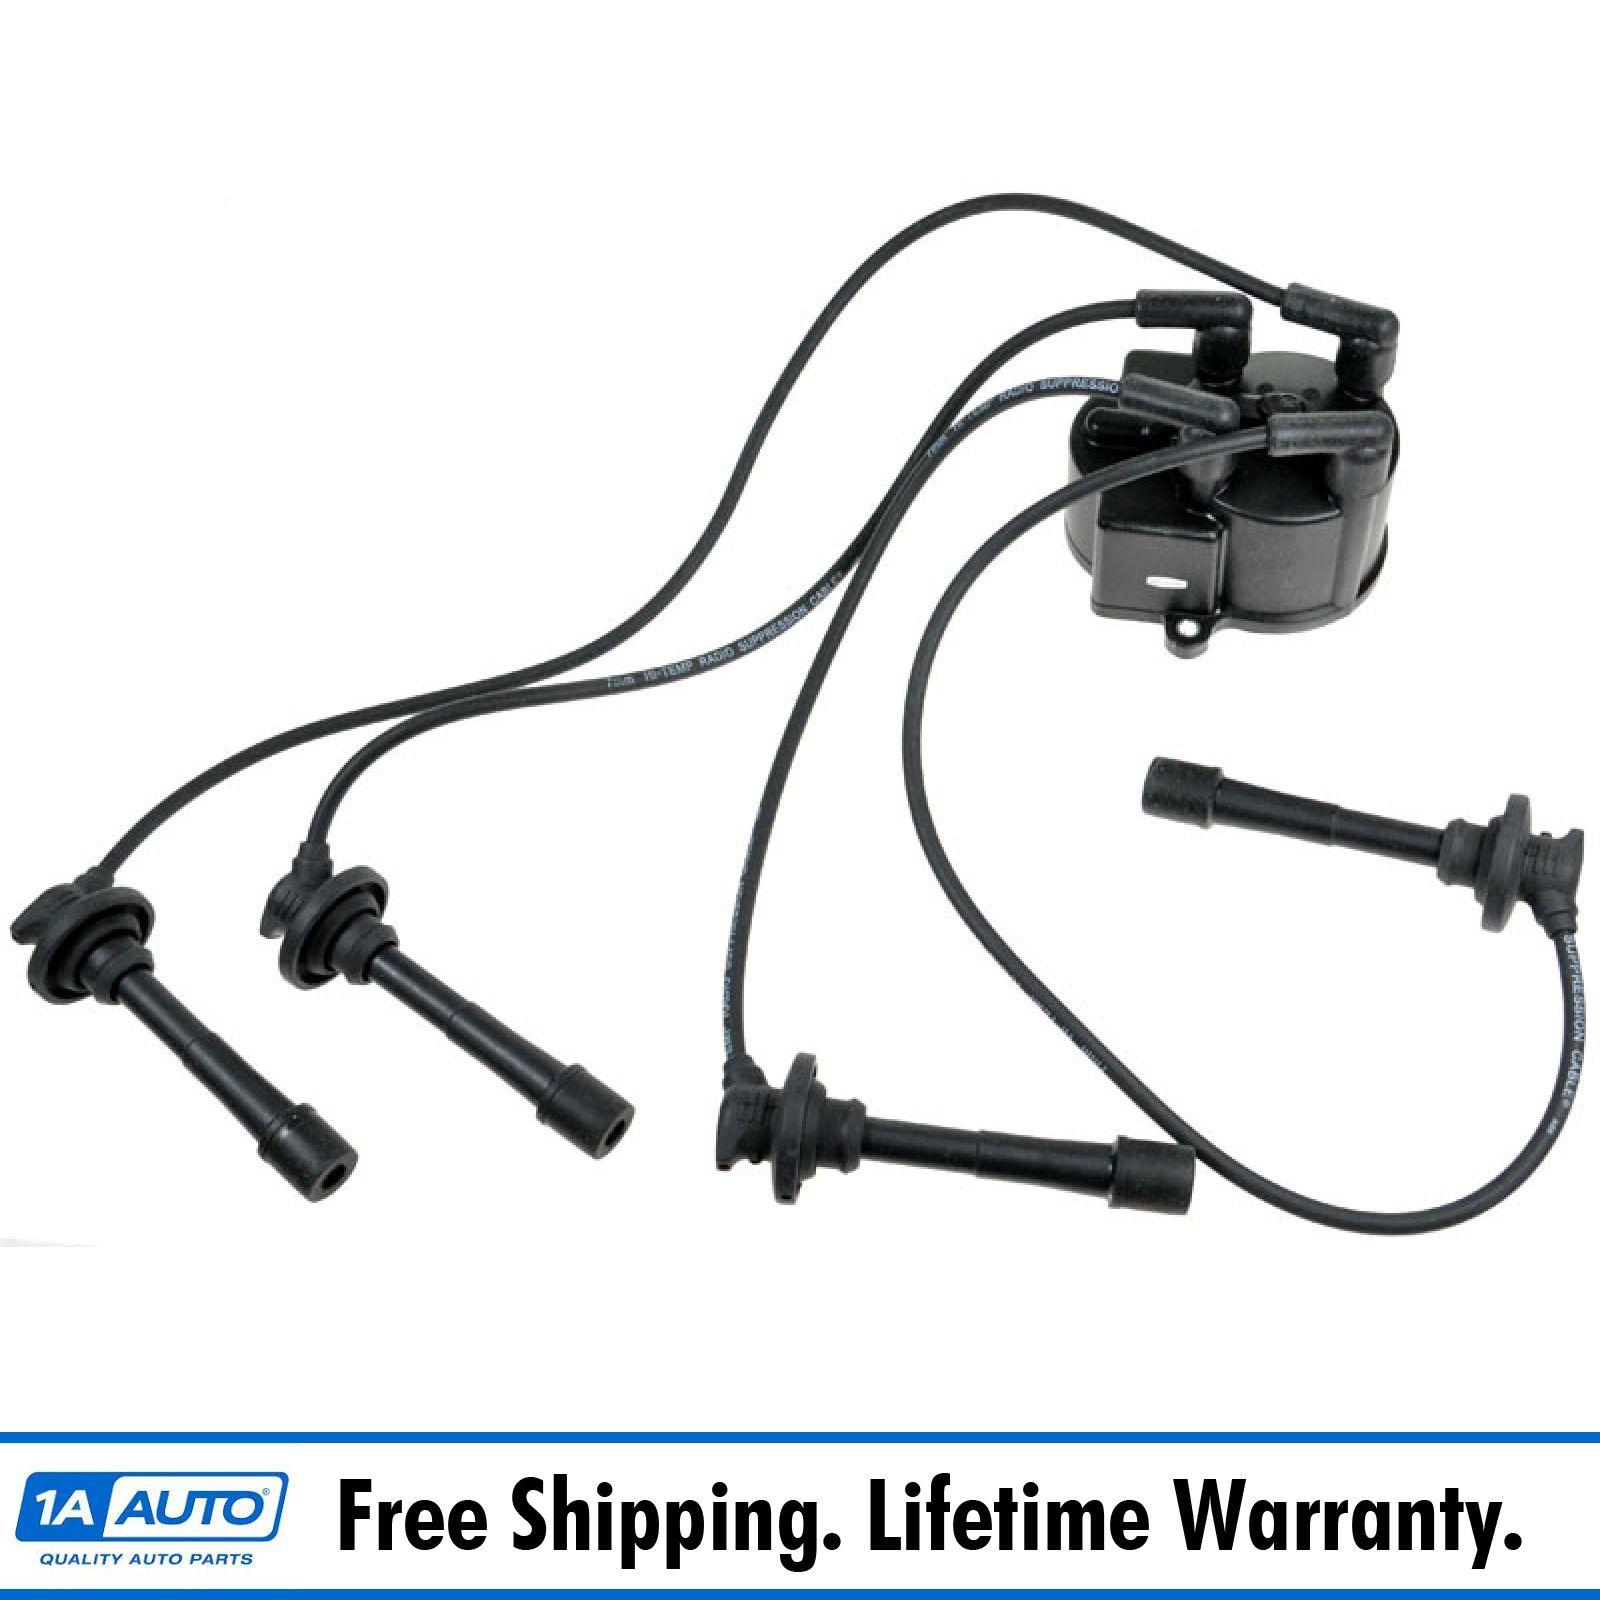 Distributor Cap w/ Spark Plug Wire Set for Corolla 4AFE 1.6L | eBayeBay